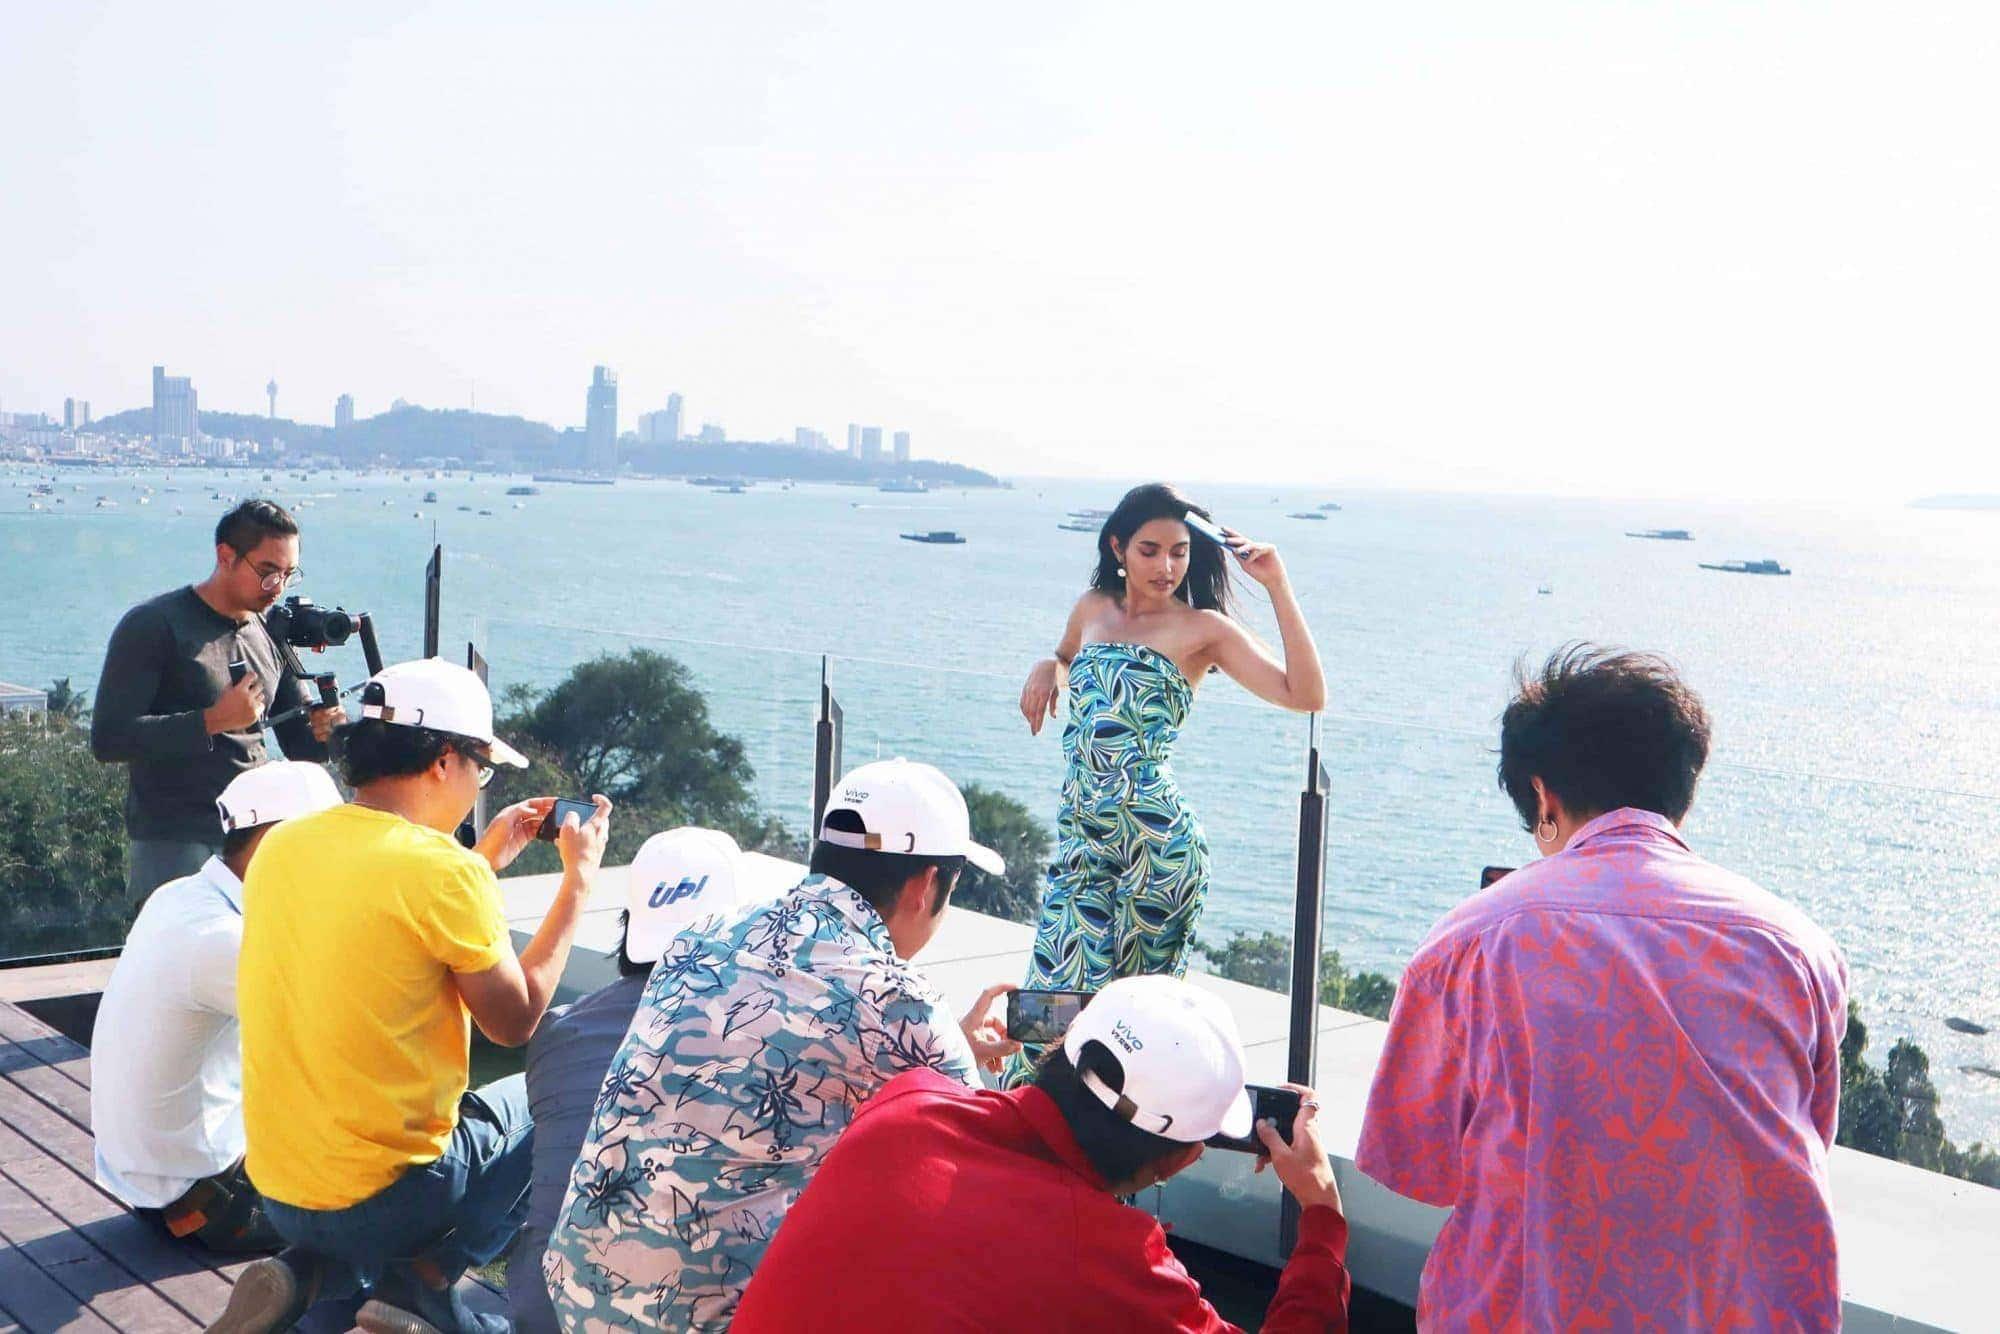 "- Vivo ประเทศไทย พาผู้โชคดีเดินทางไปร่วมทริปเอ็กซ์คลูซีฟ Vivo V15 Coming ""UP"" Summer สุดหรูริมหาดพัทยา"